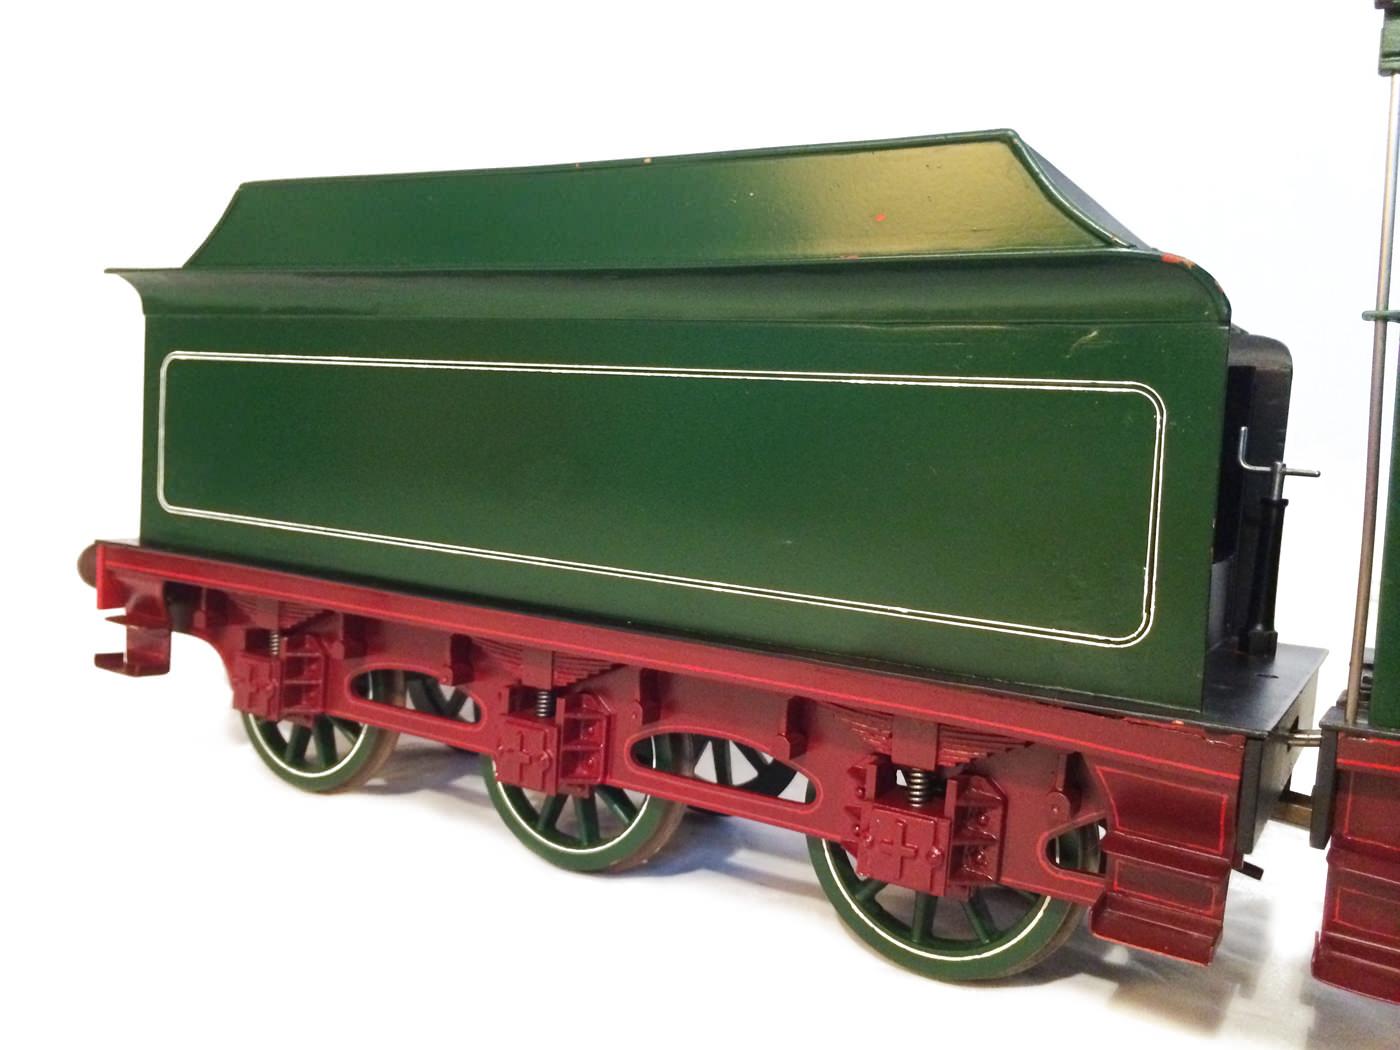 test 3 and a half inch gauge GCR Sir Sam Fay I Class live steam locomotive for sale 11